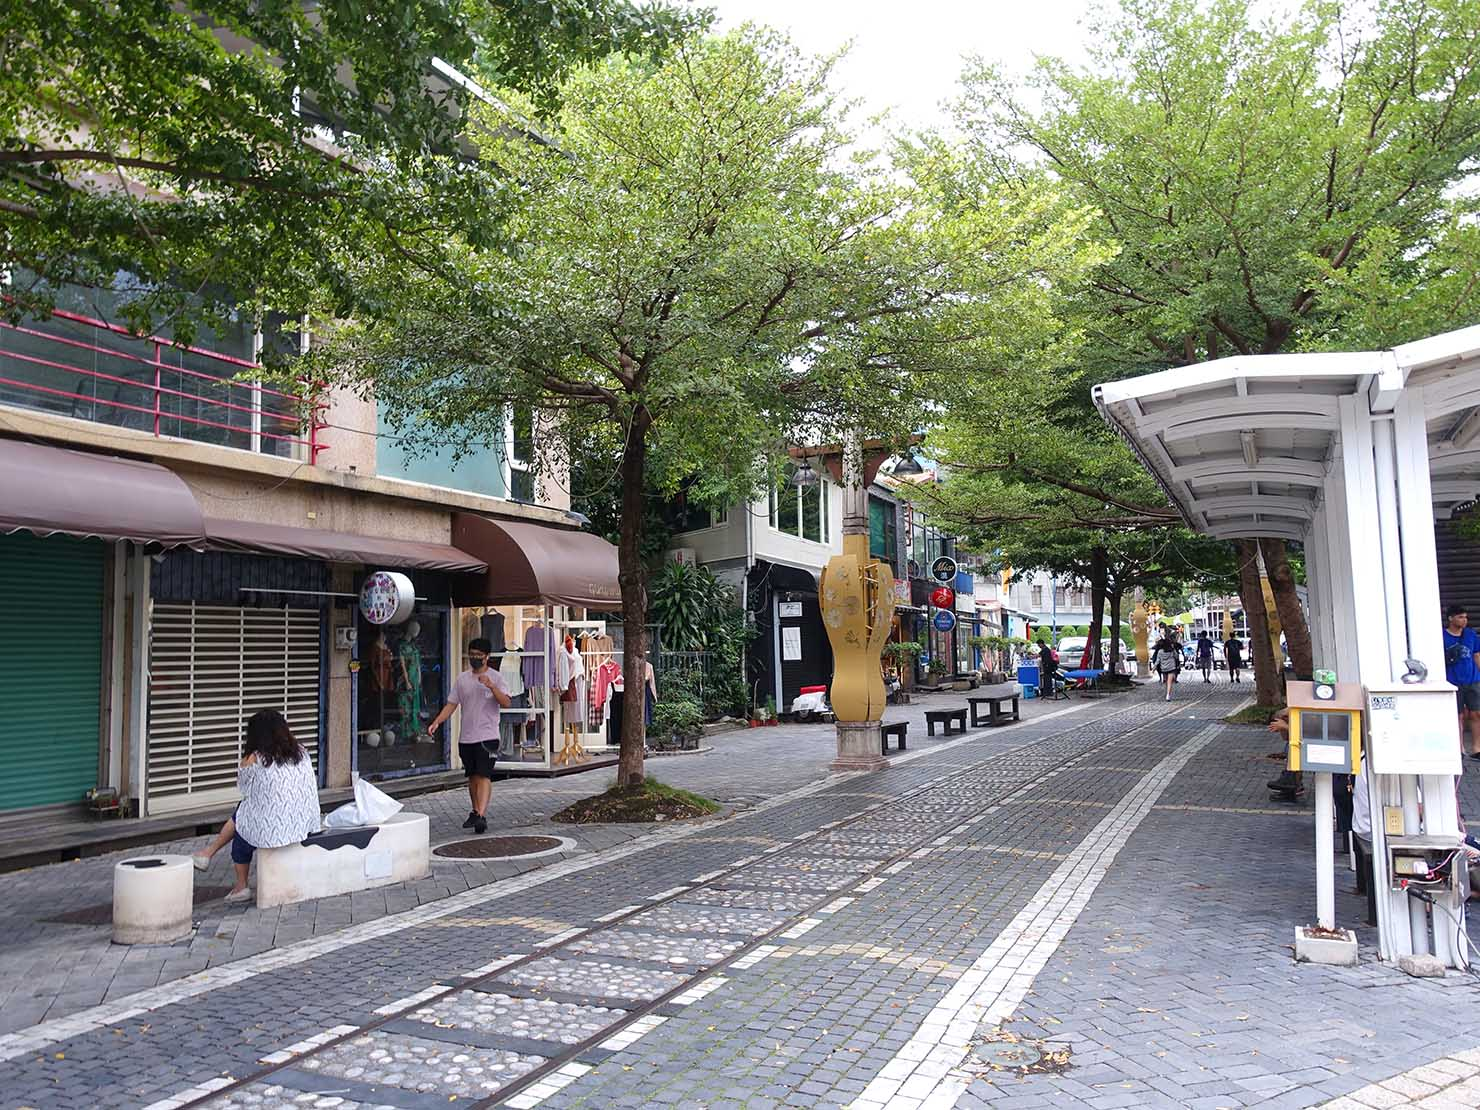 花蓮市街の有名観光スポット「舊鐵道行人徒步區」